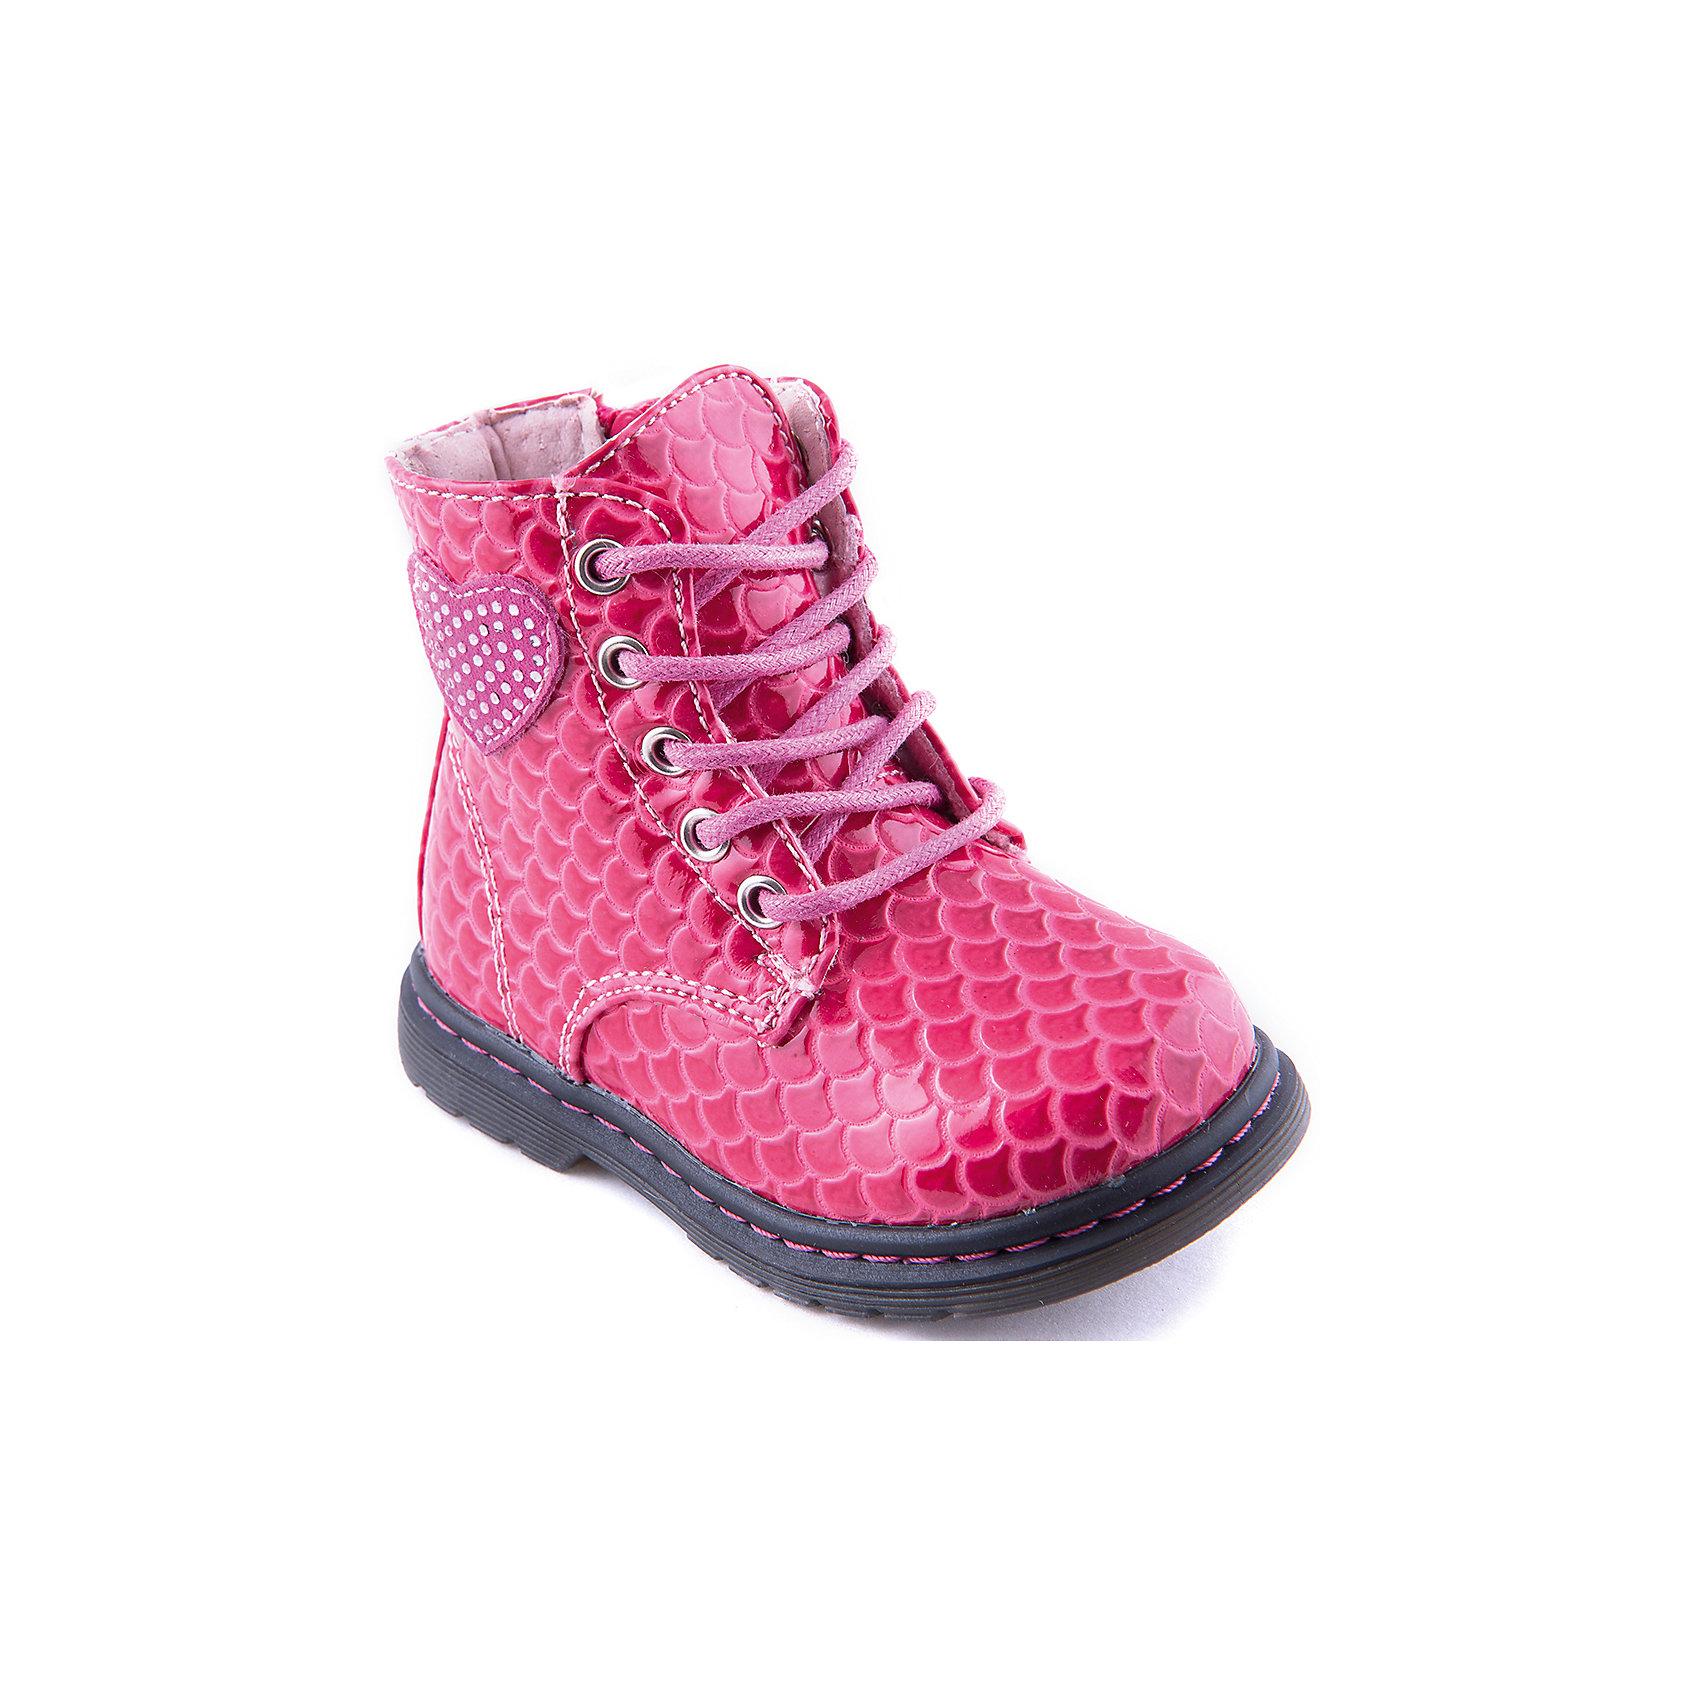 Indigo kids Ботинки для девочки Indigo kids indigo kids обувь официальный сайт